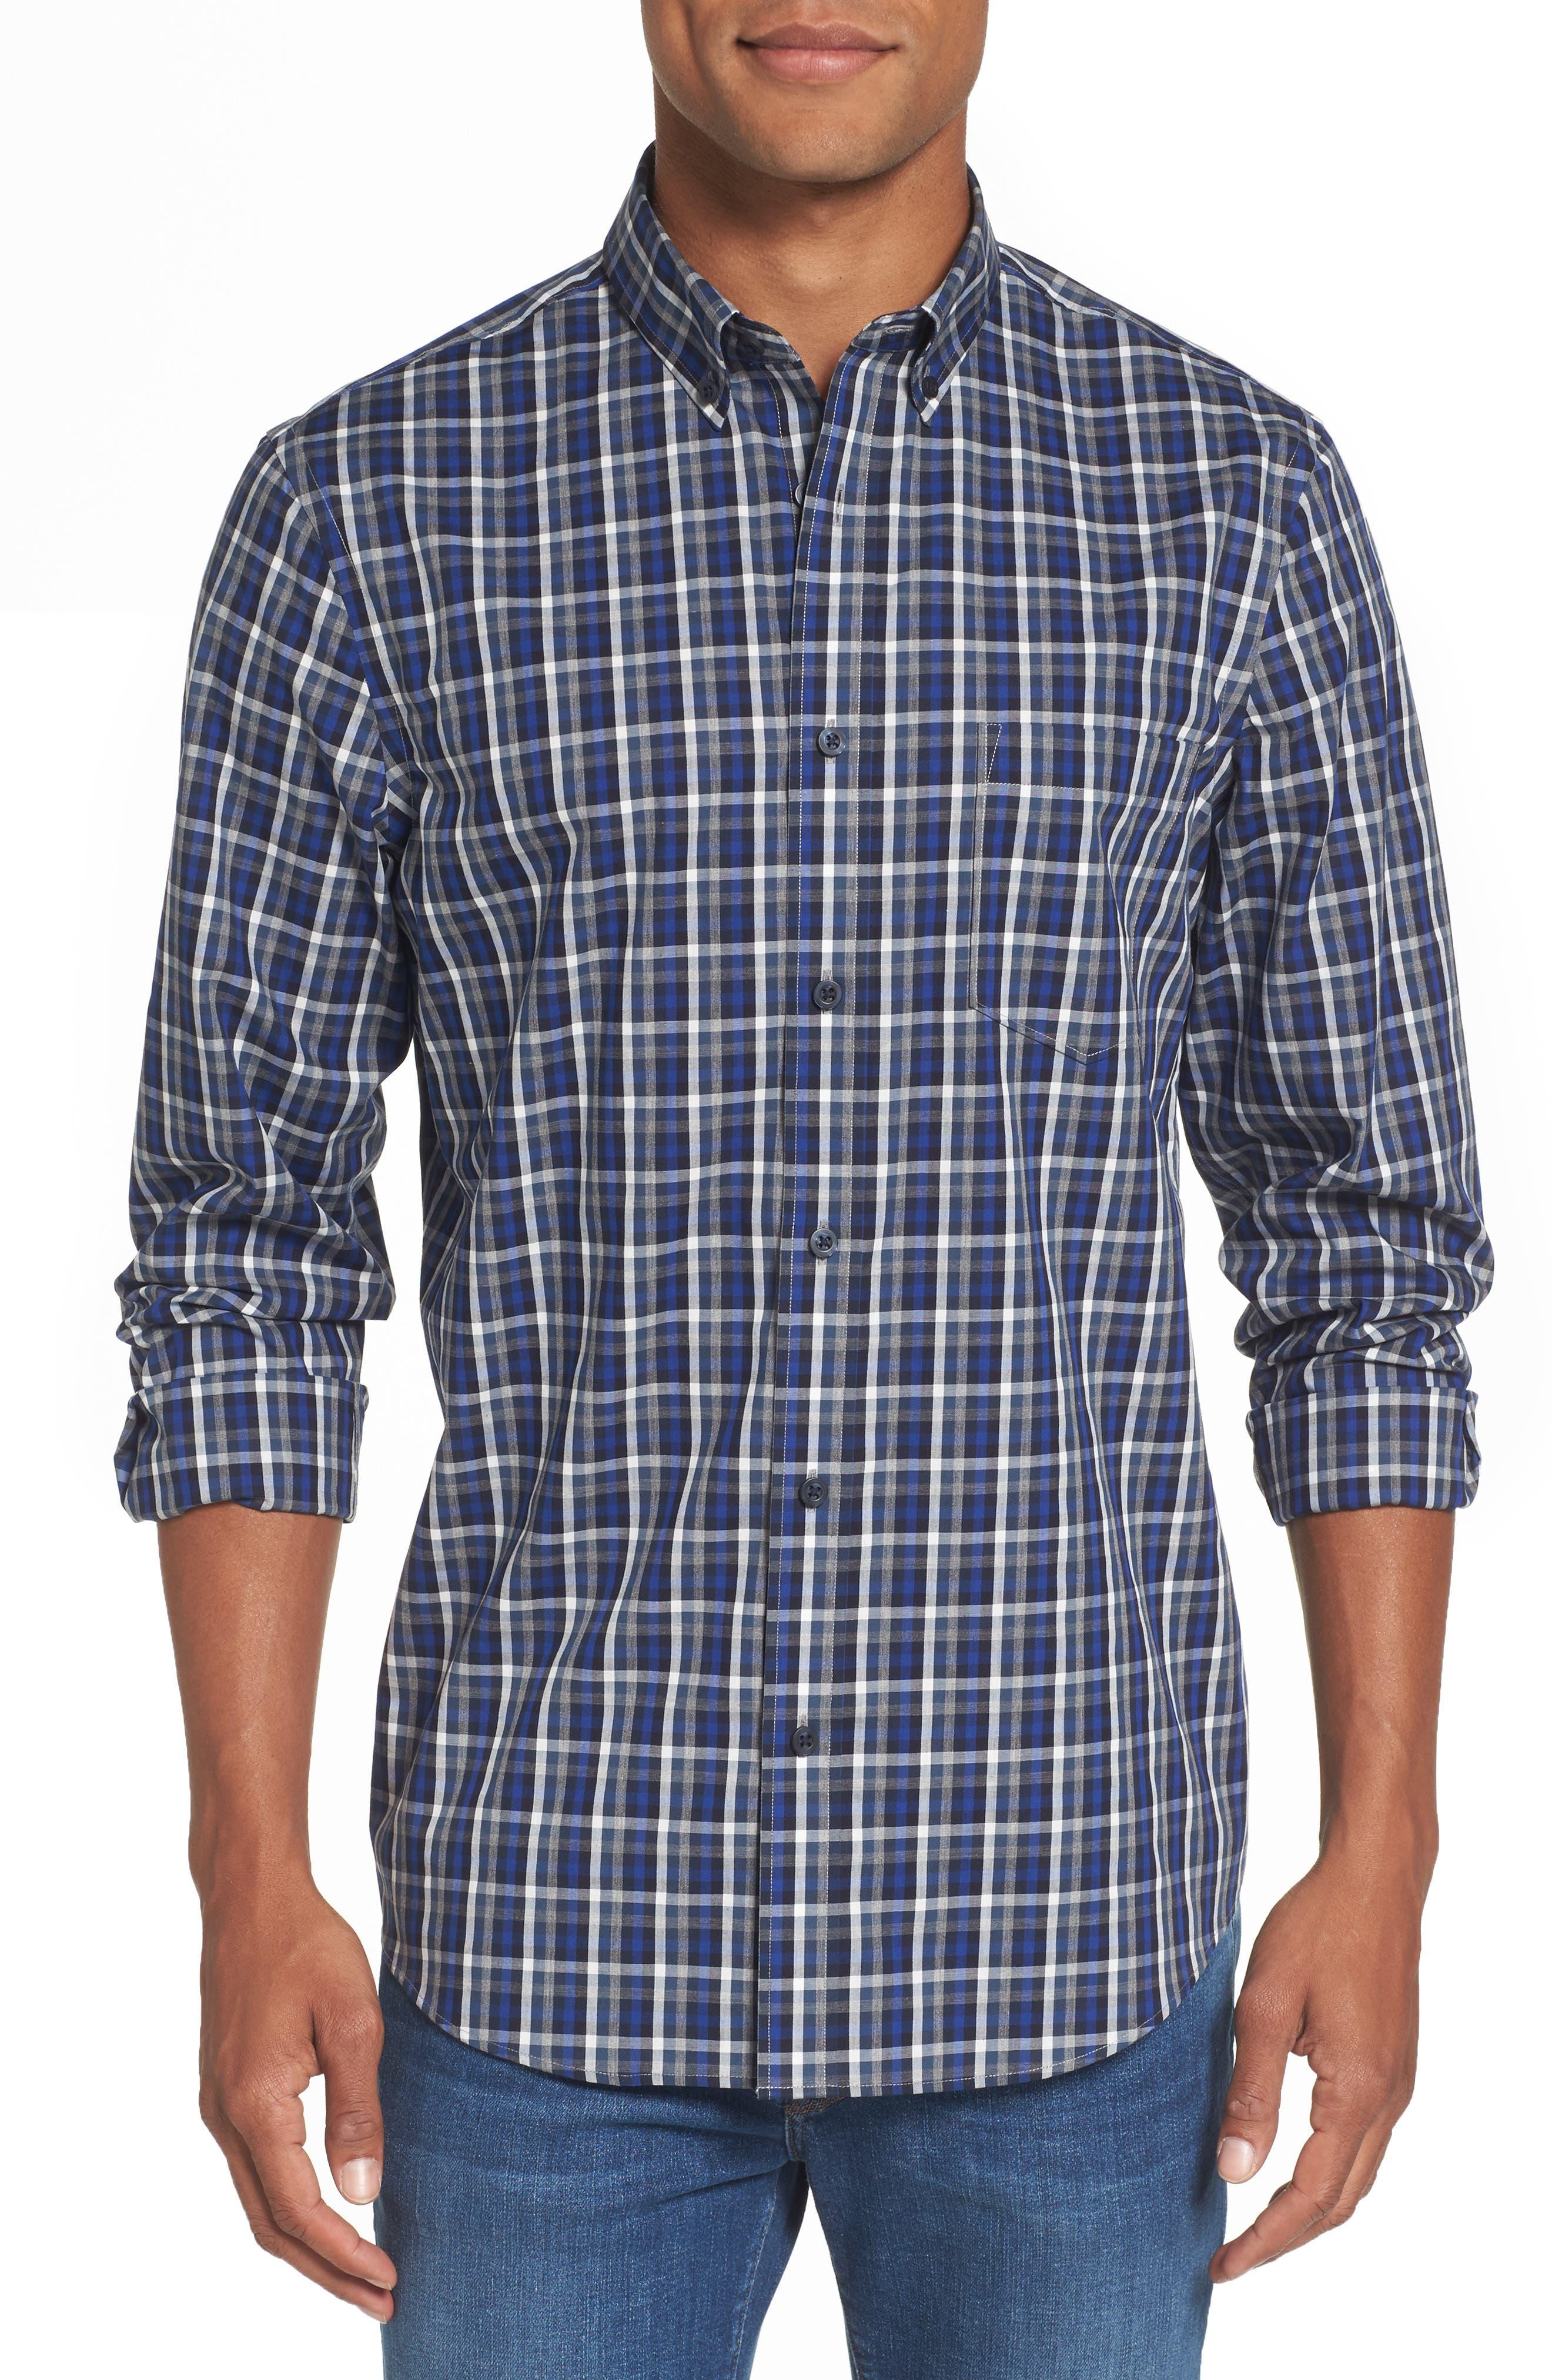 NORDSTROM MENS SHOP Regular Fit Non-Iron Spade Check Dress Shirt